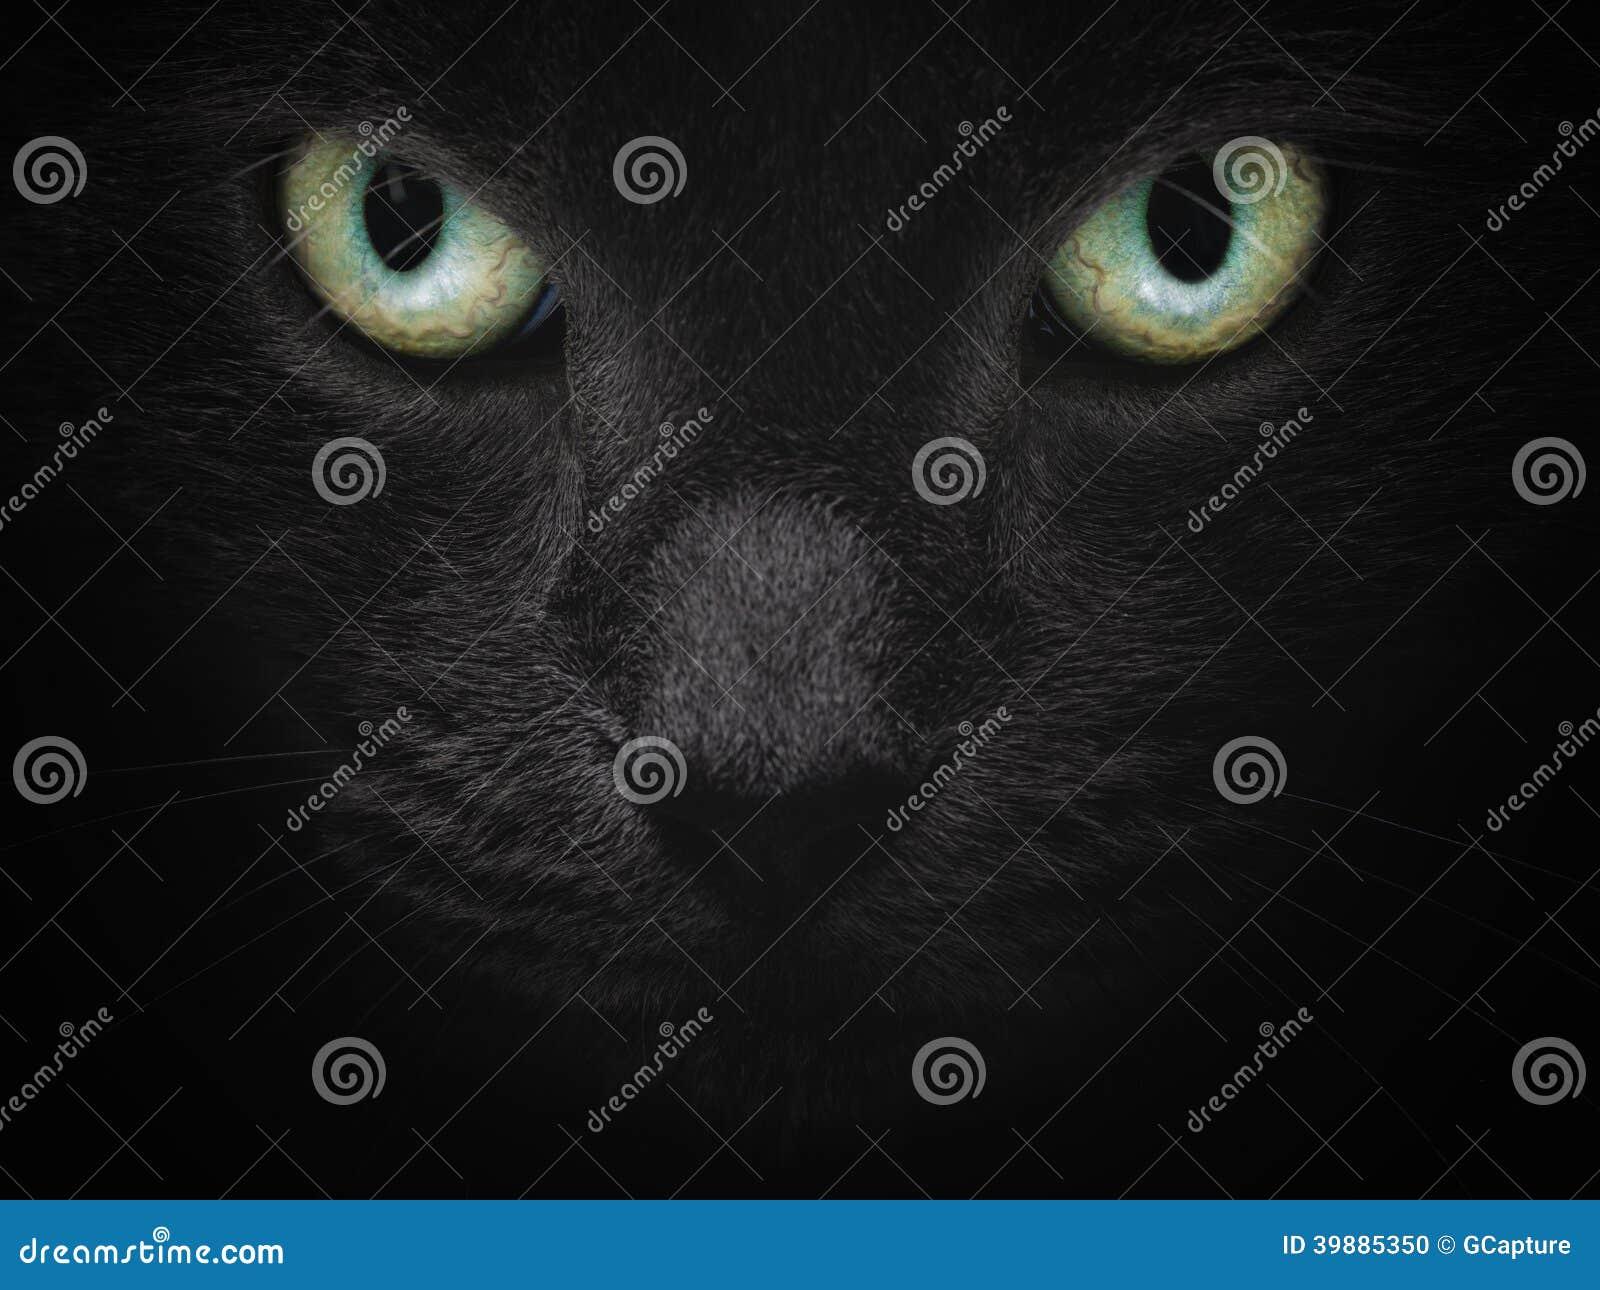 Close up portrait of serious british shorhair cat